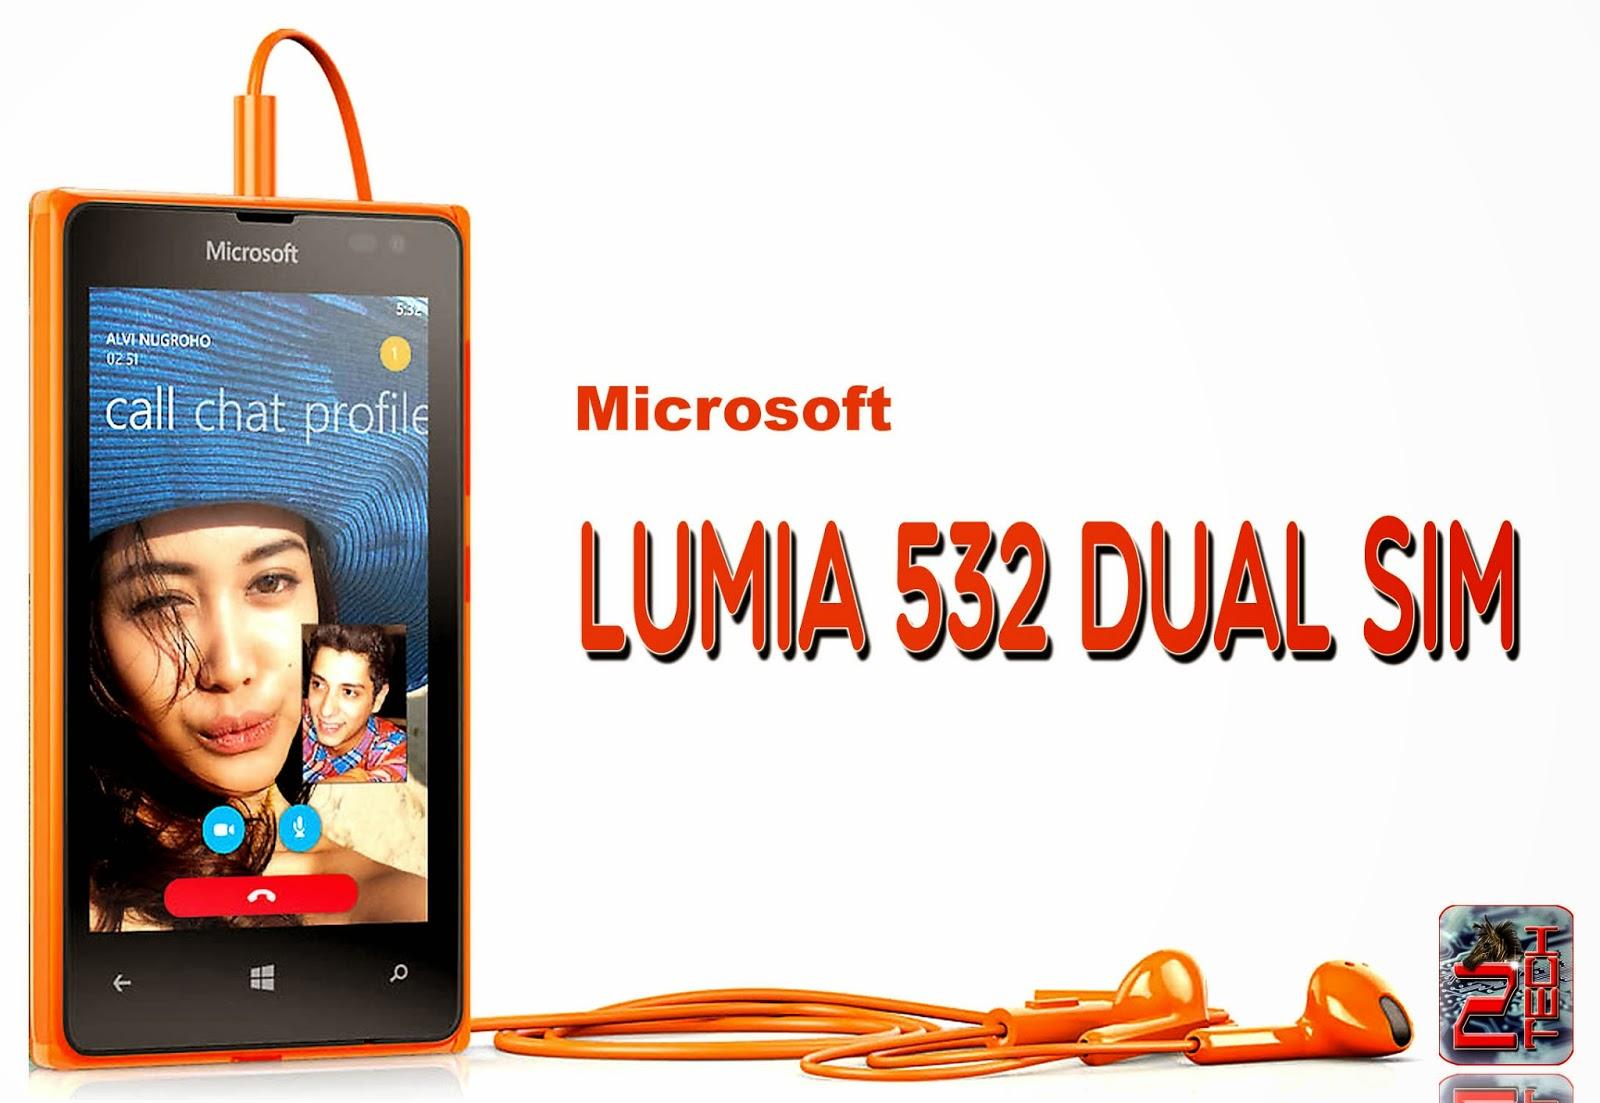 Microsoft Lumia 532 Dual SiM with 4 inch lcd displaym 5 mp rear camera, 8 GB internal storage, 1 GB RAM etc...